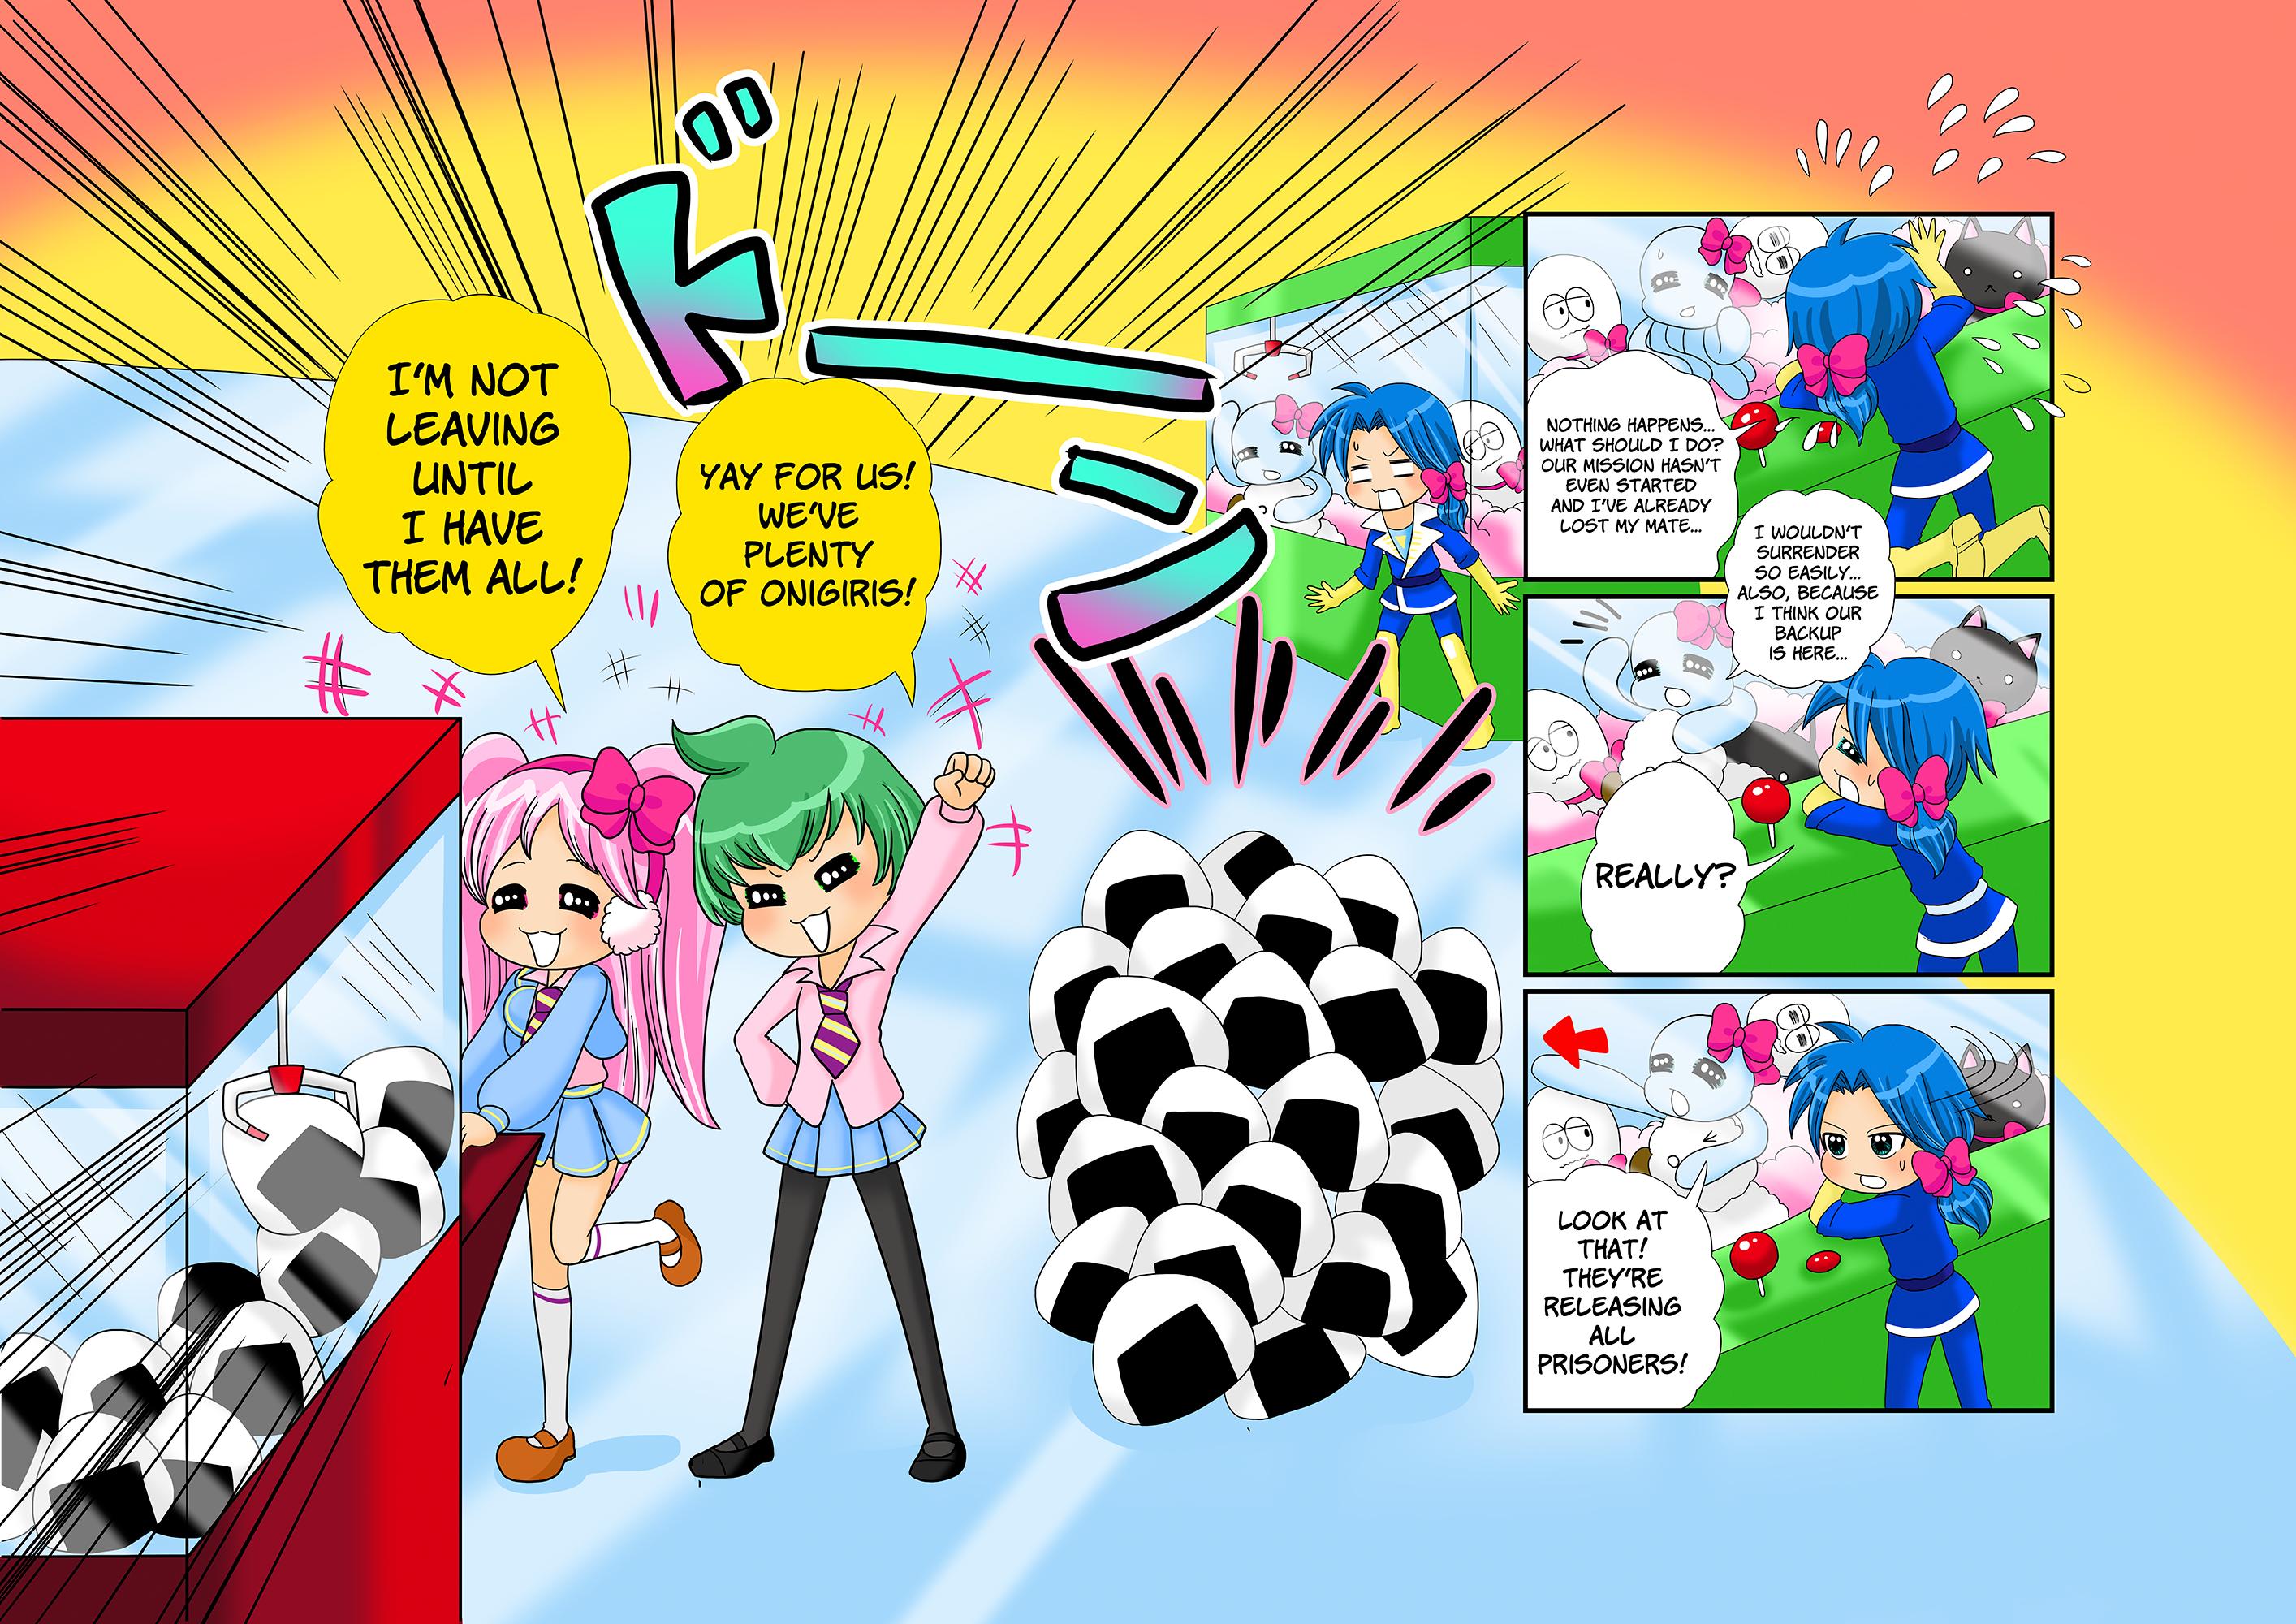 Mitsume Temo pilot manga - page 20-21 by Takisse